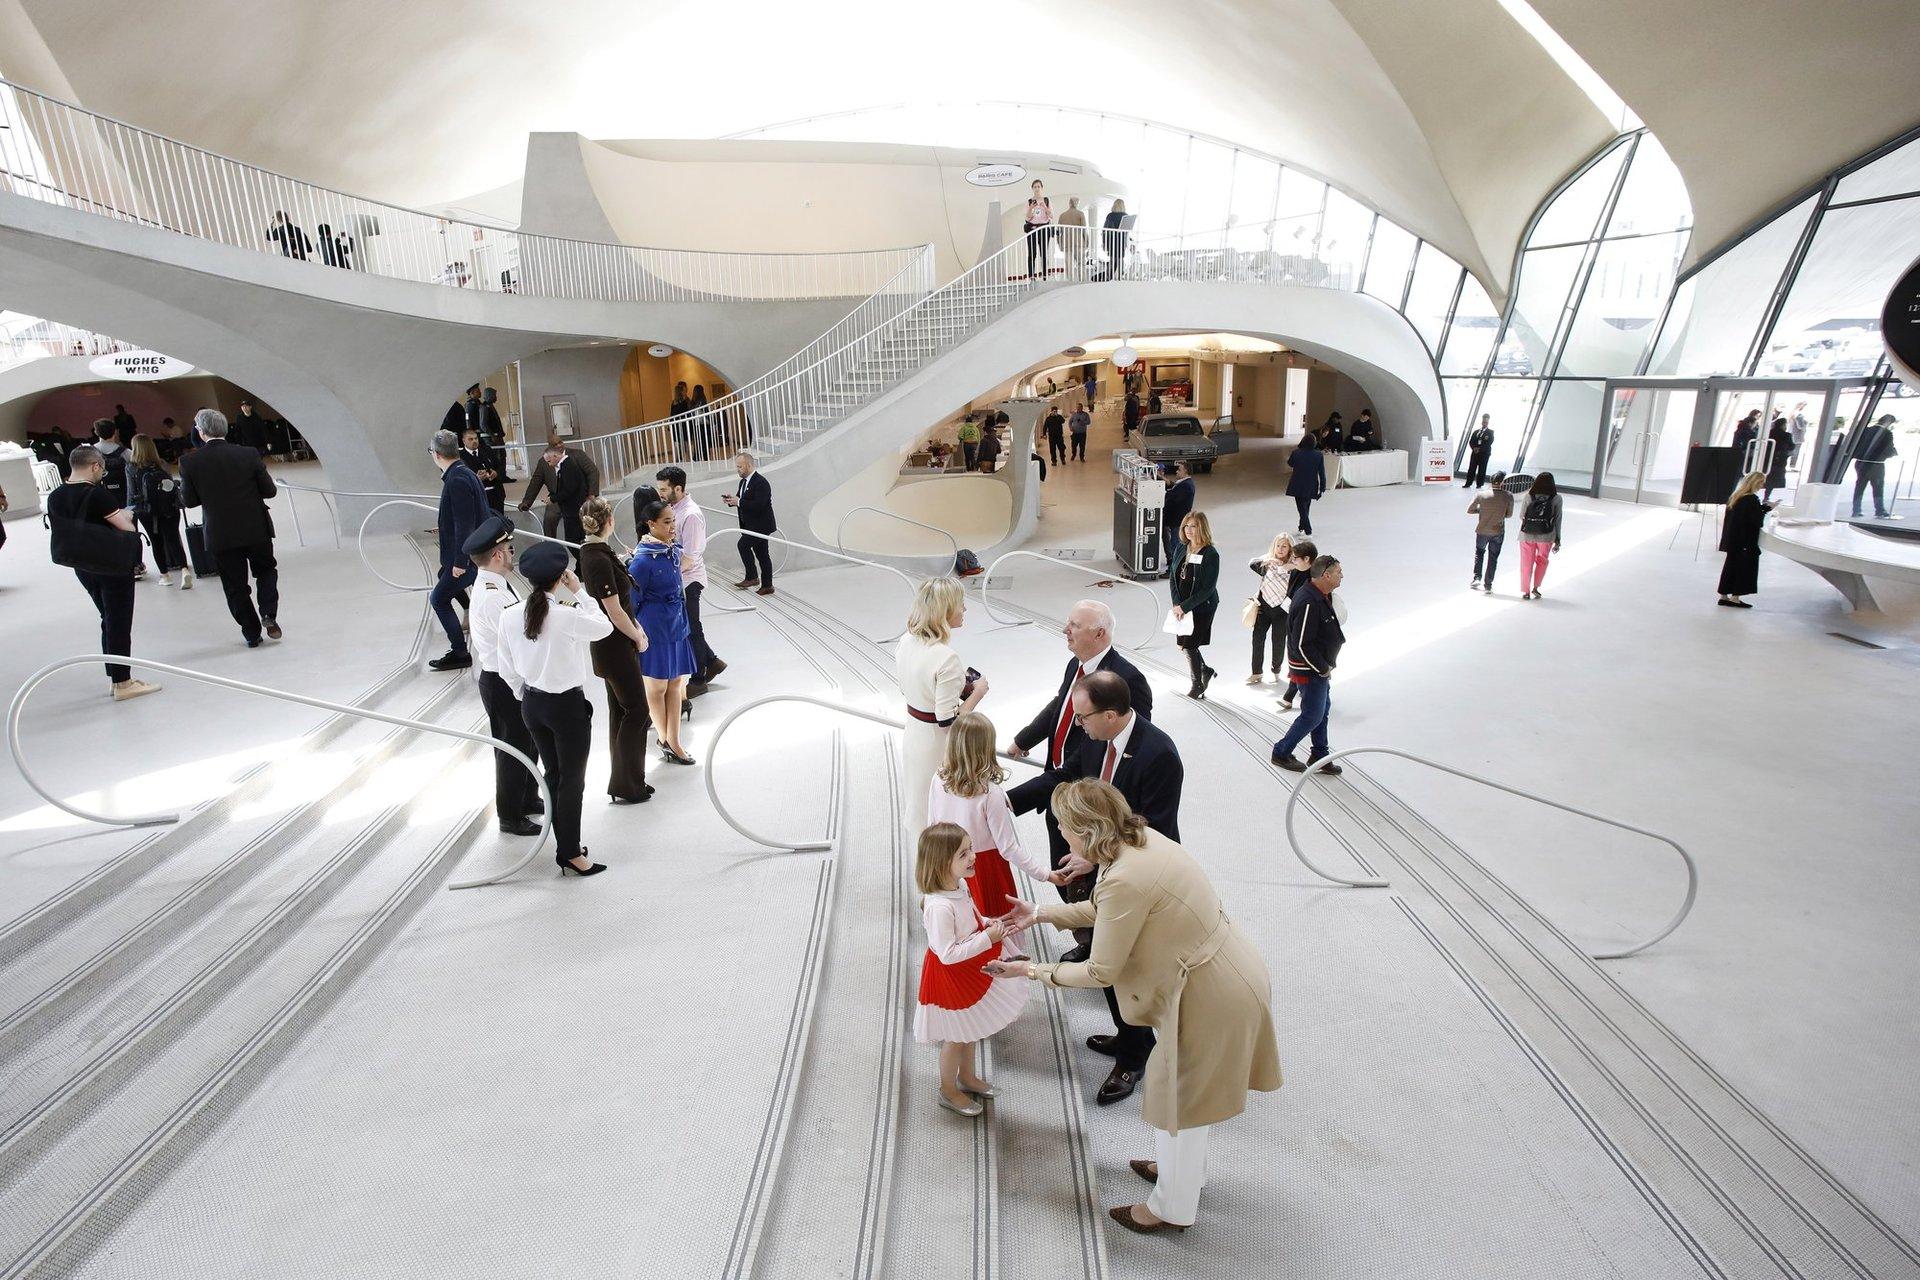 'Retro' 60s New York terminal gets new life as luxury hotel